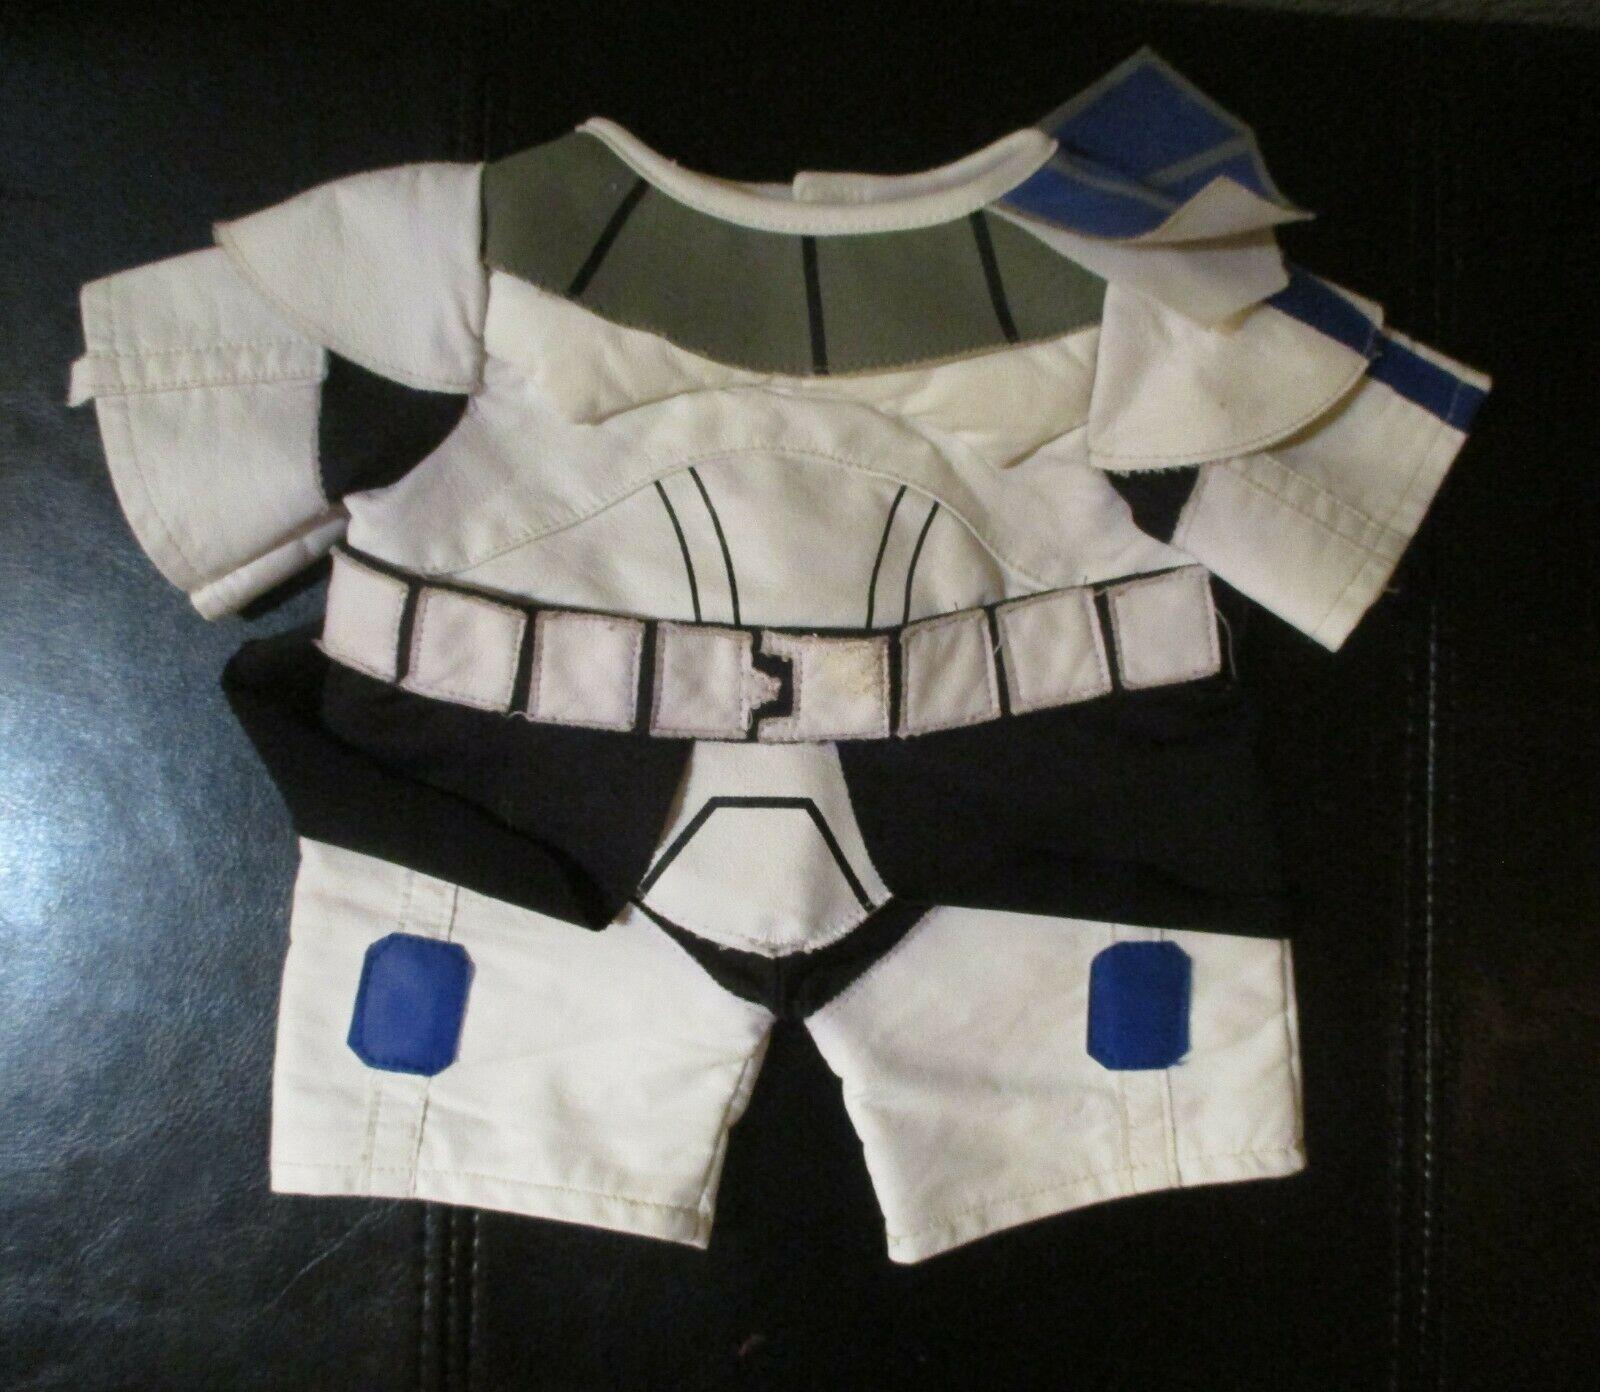 Build A Bear Workshop Star Wars Storm Trooper Outfit - $8.90